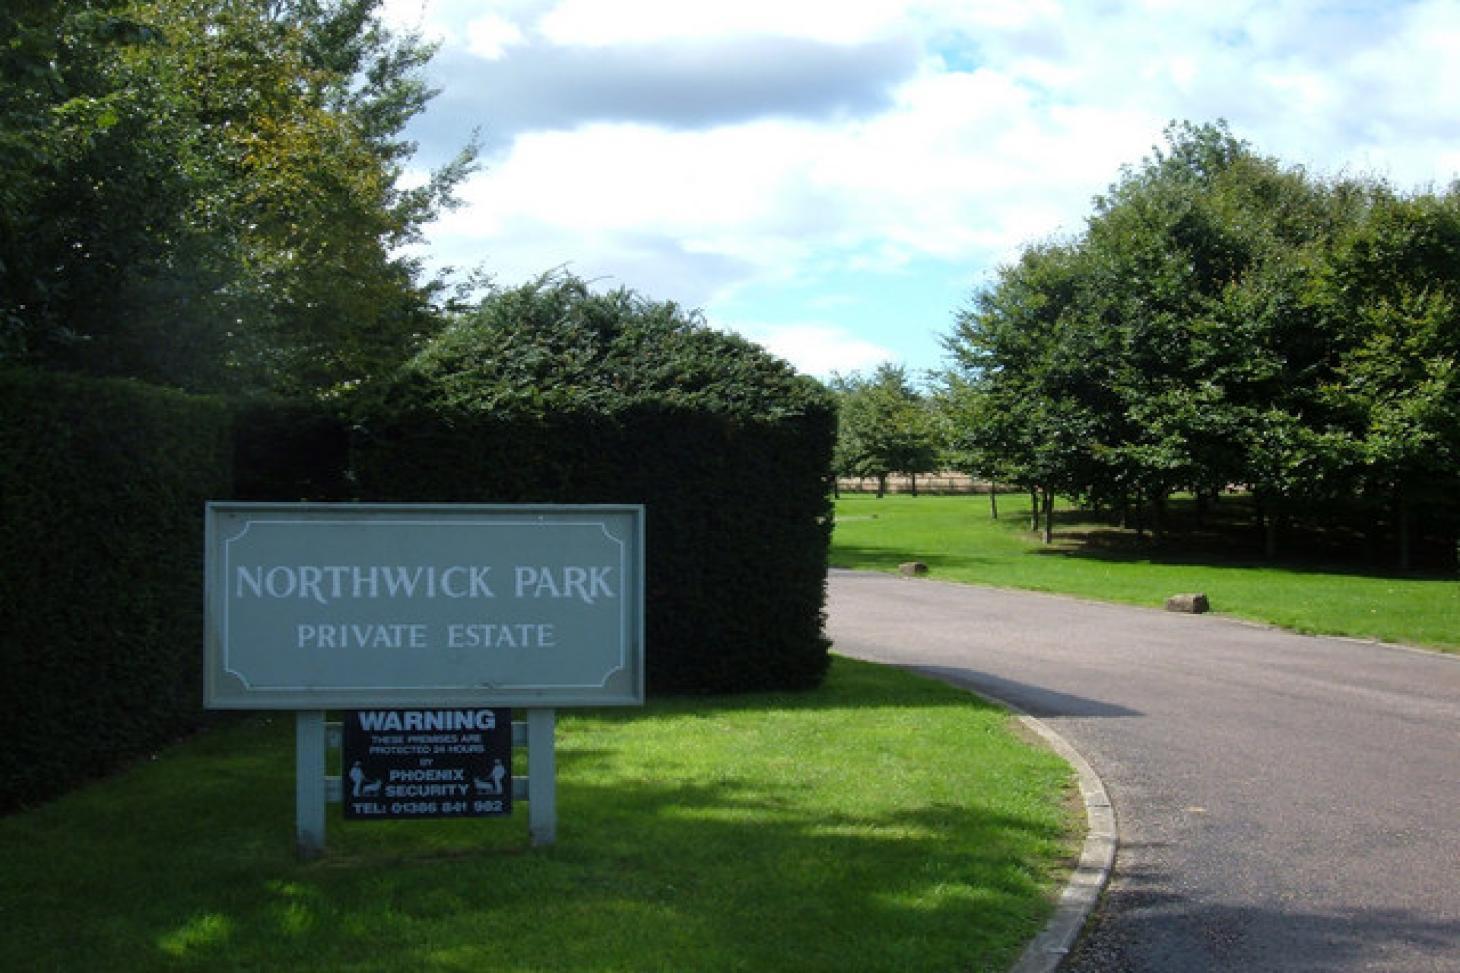 Northwick Park 11 a side | Grass football pitch